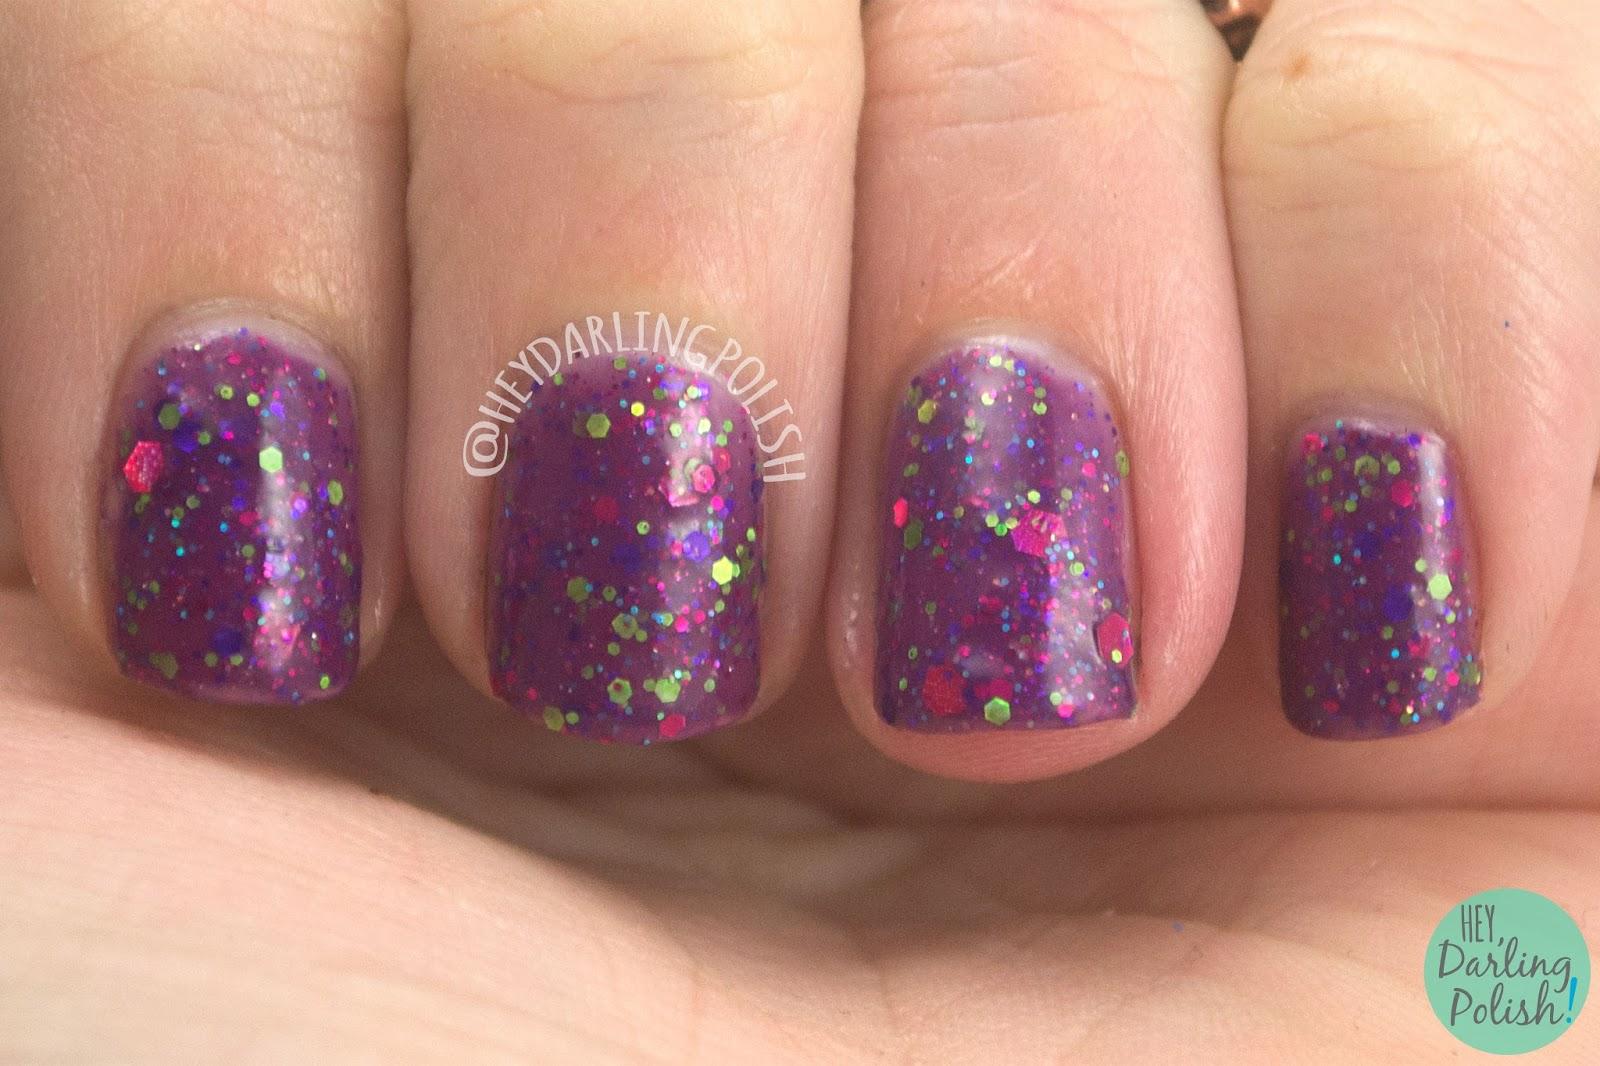 sugar plum faerie, nails, nail art, nail polish, indie nail polish, indie polish, kbshimmer, hey darling polish, swatch, review, purple, glitter,